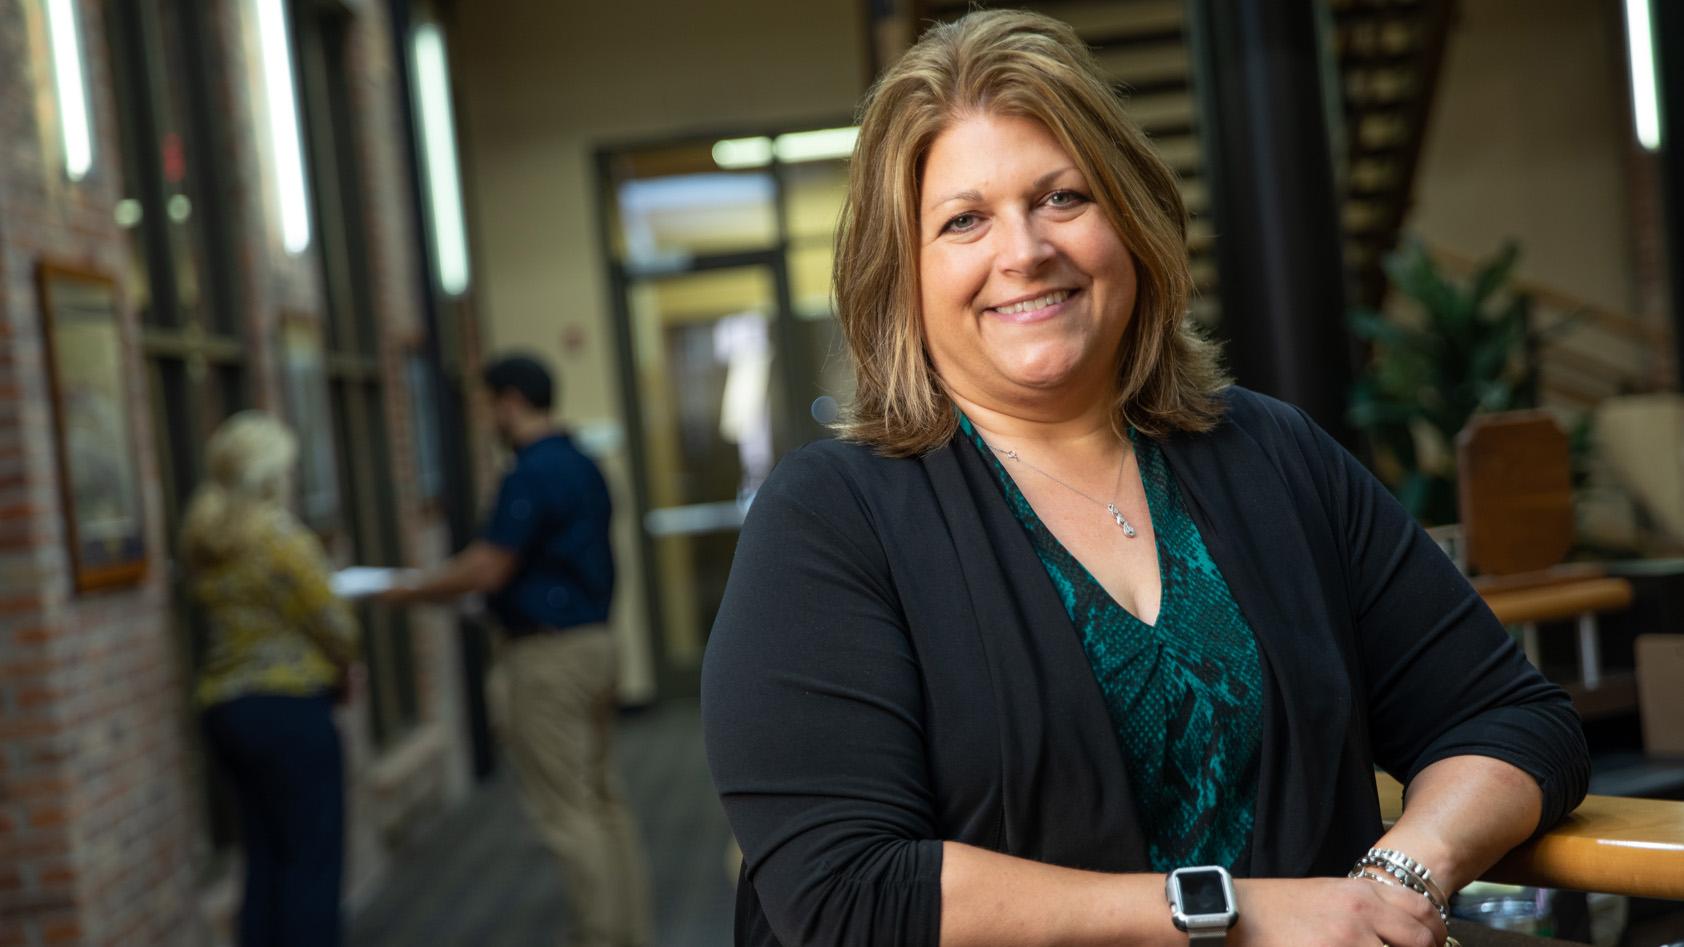 Leanne Panduren, CEO of ROWE Professional Services